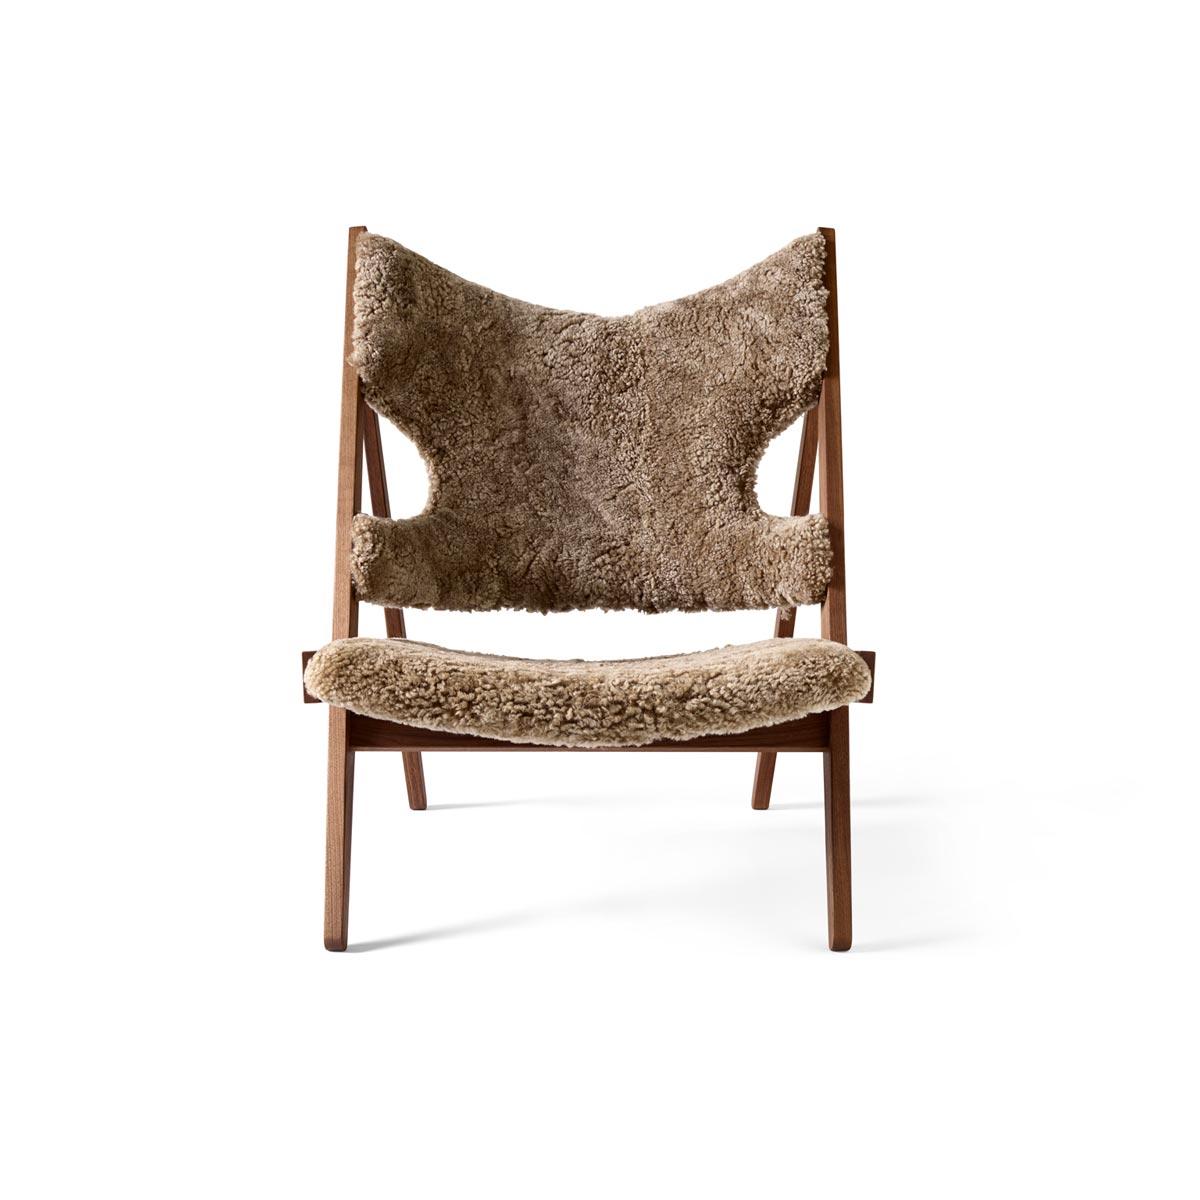 9682919 Knitting Lounge Chair Walnut Cork 19 Front 1 1